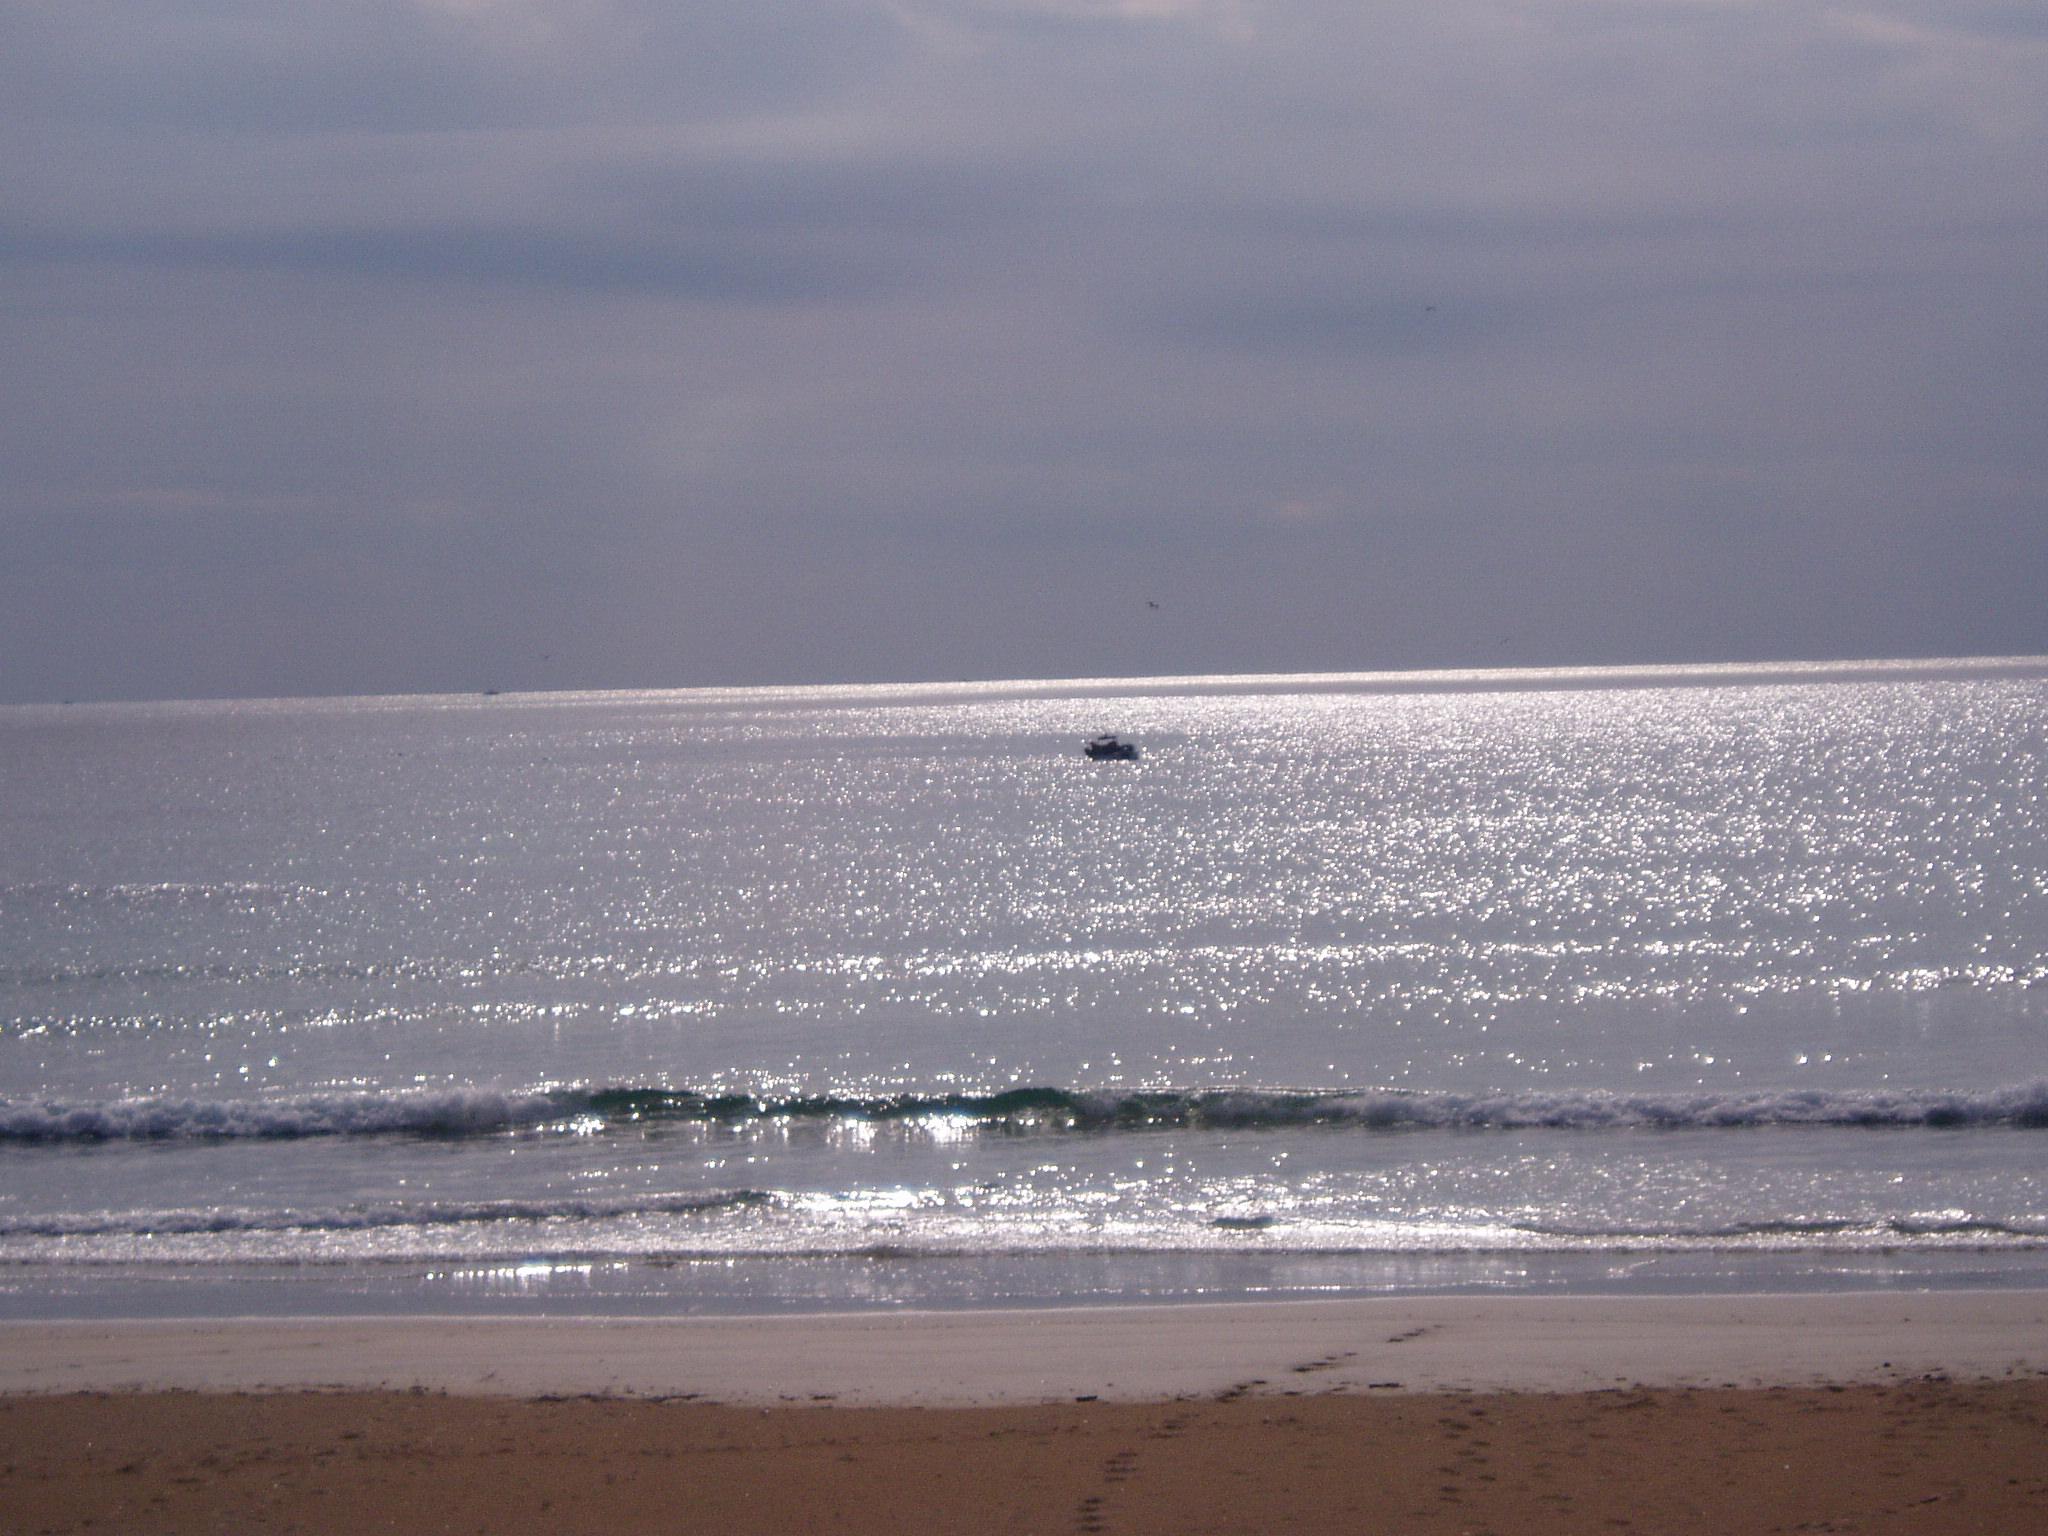 Foto playa As Furnas. Mar prateado